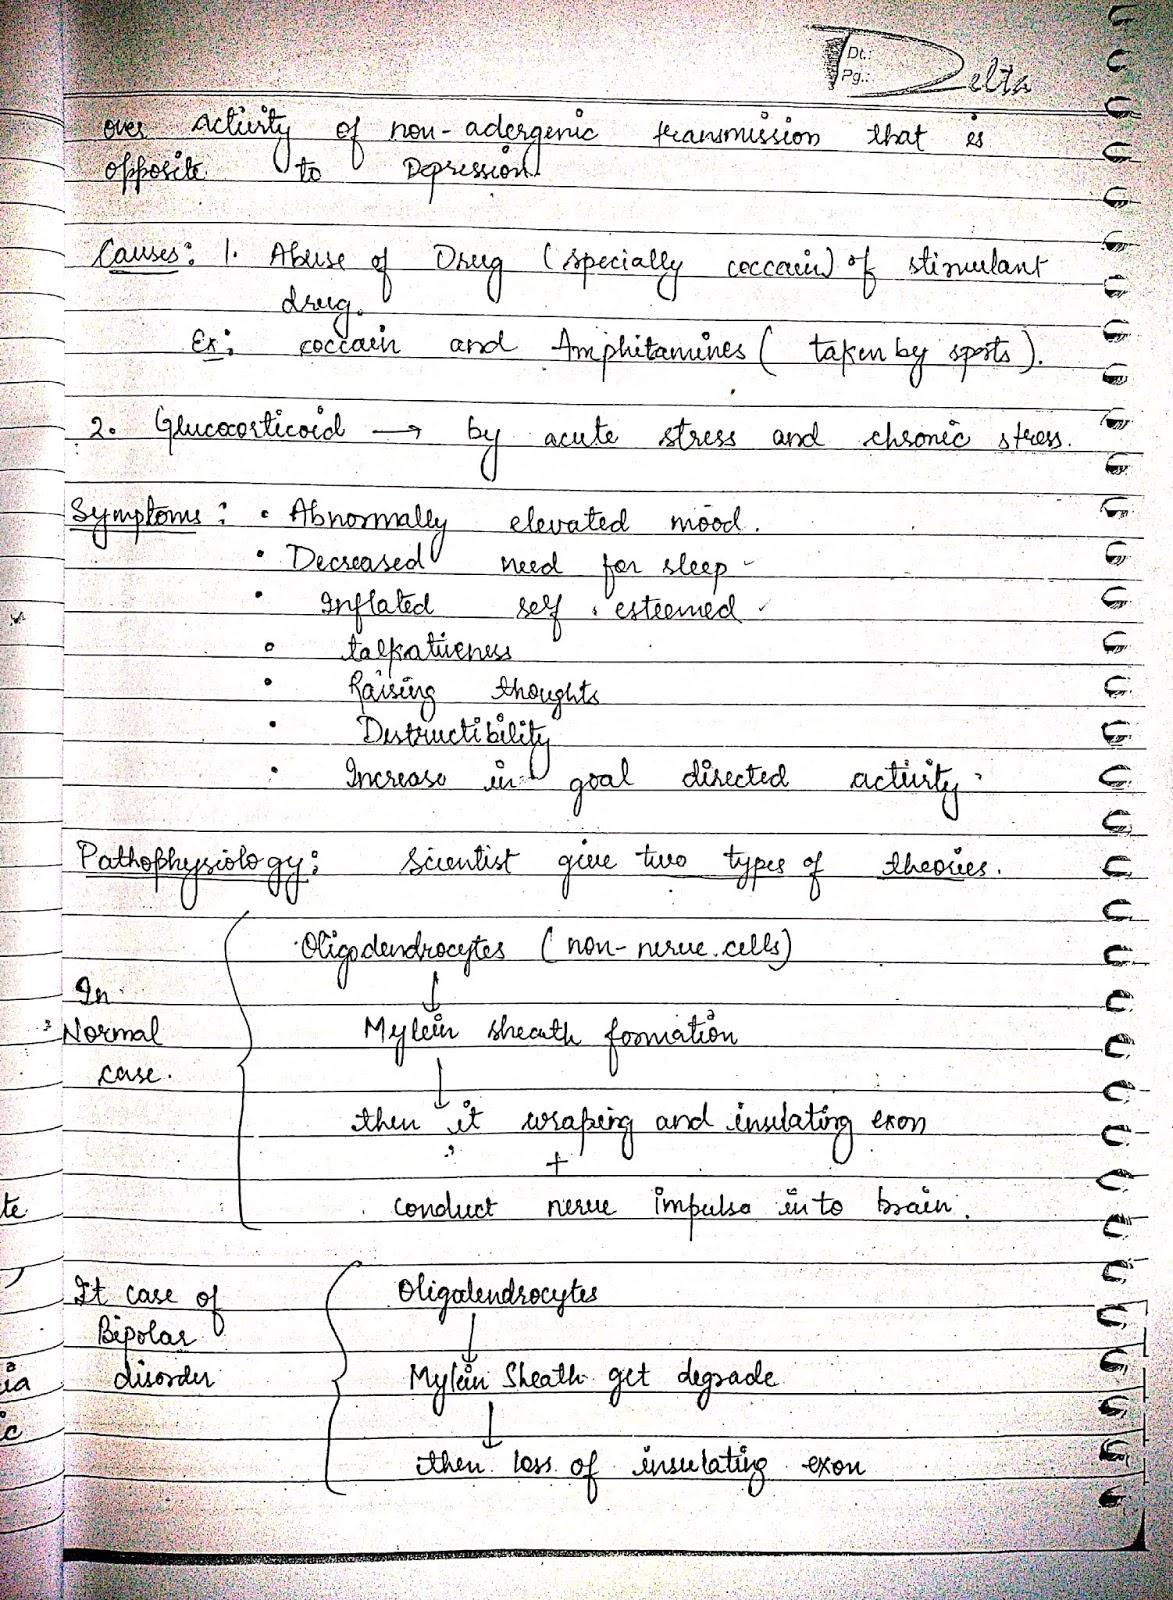 pathophysiology - nervous system disorder psychiatric disorder